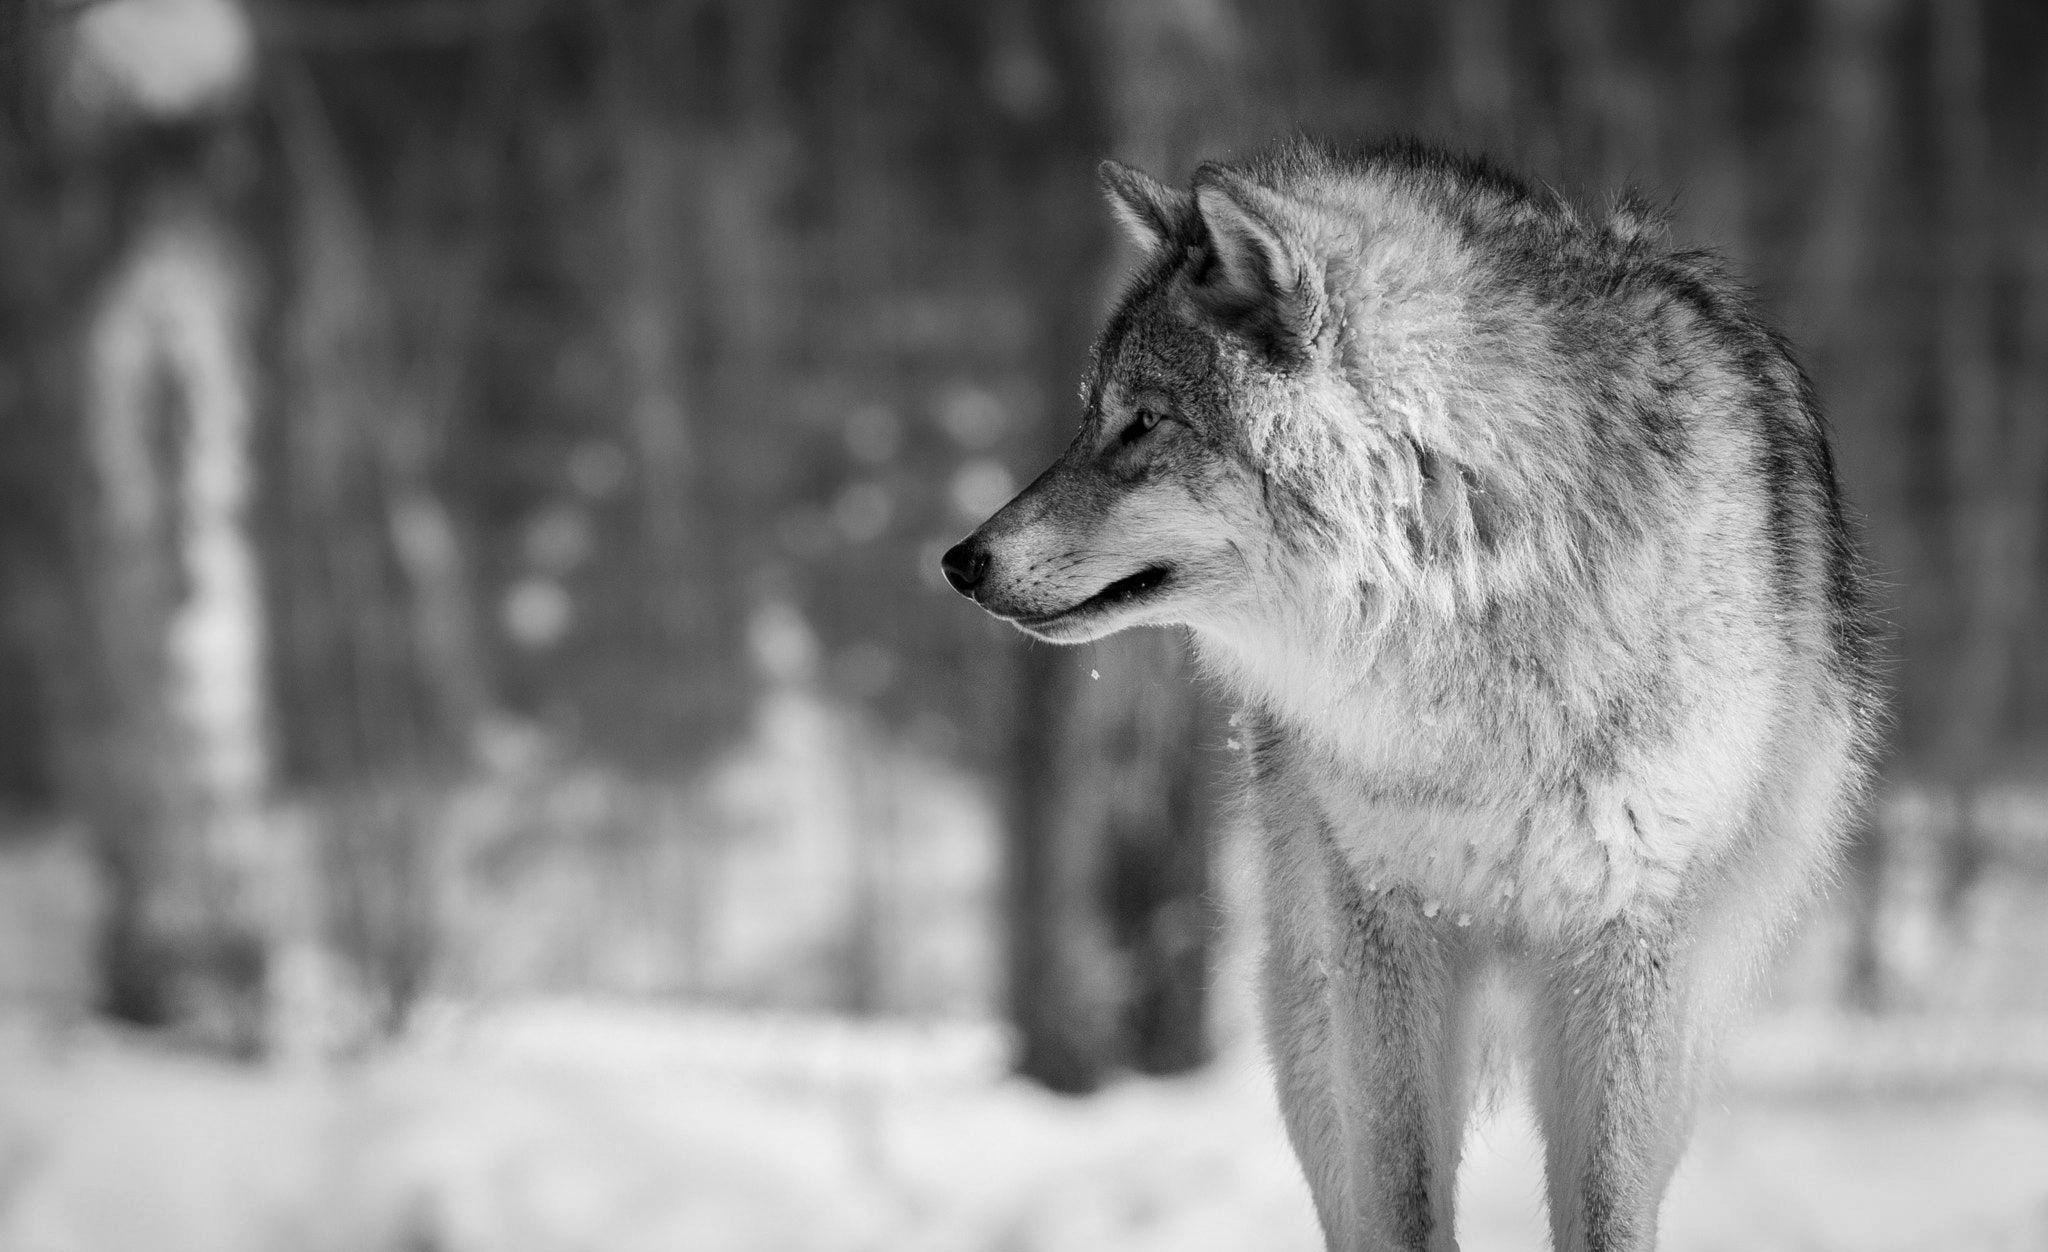 Black Wolf 4K Wallpapers - Top Free Black Wolf 4K ...